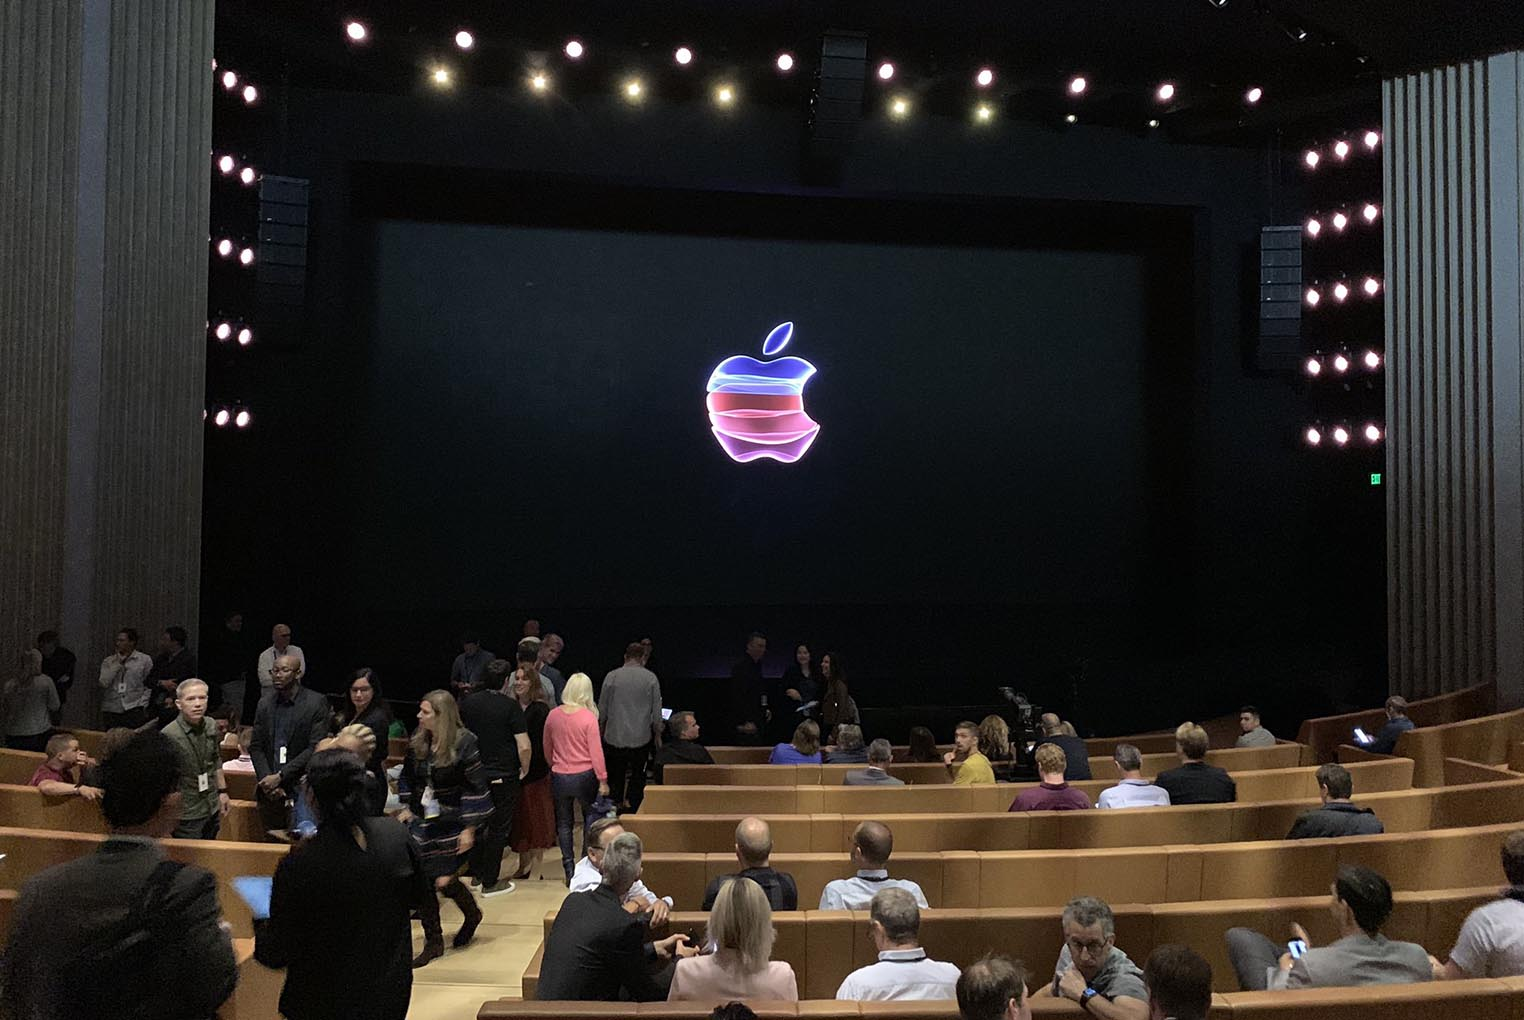 Scène Steve Jobs Theater septembre 2019